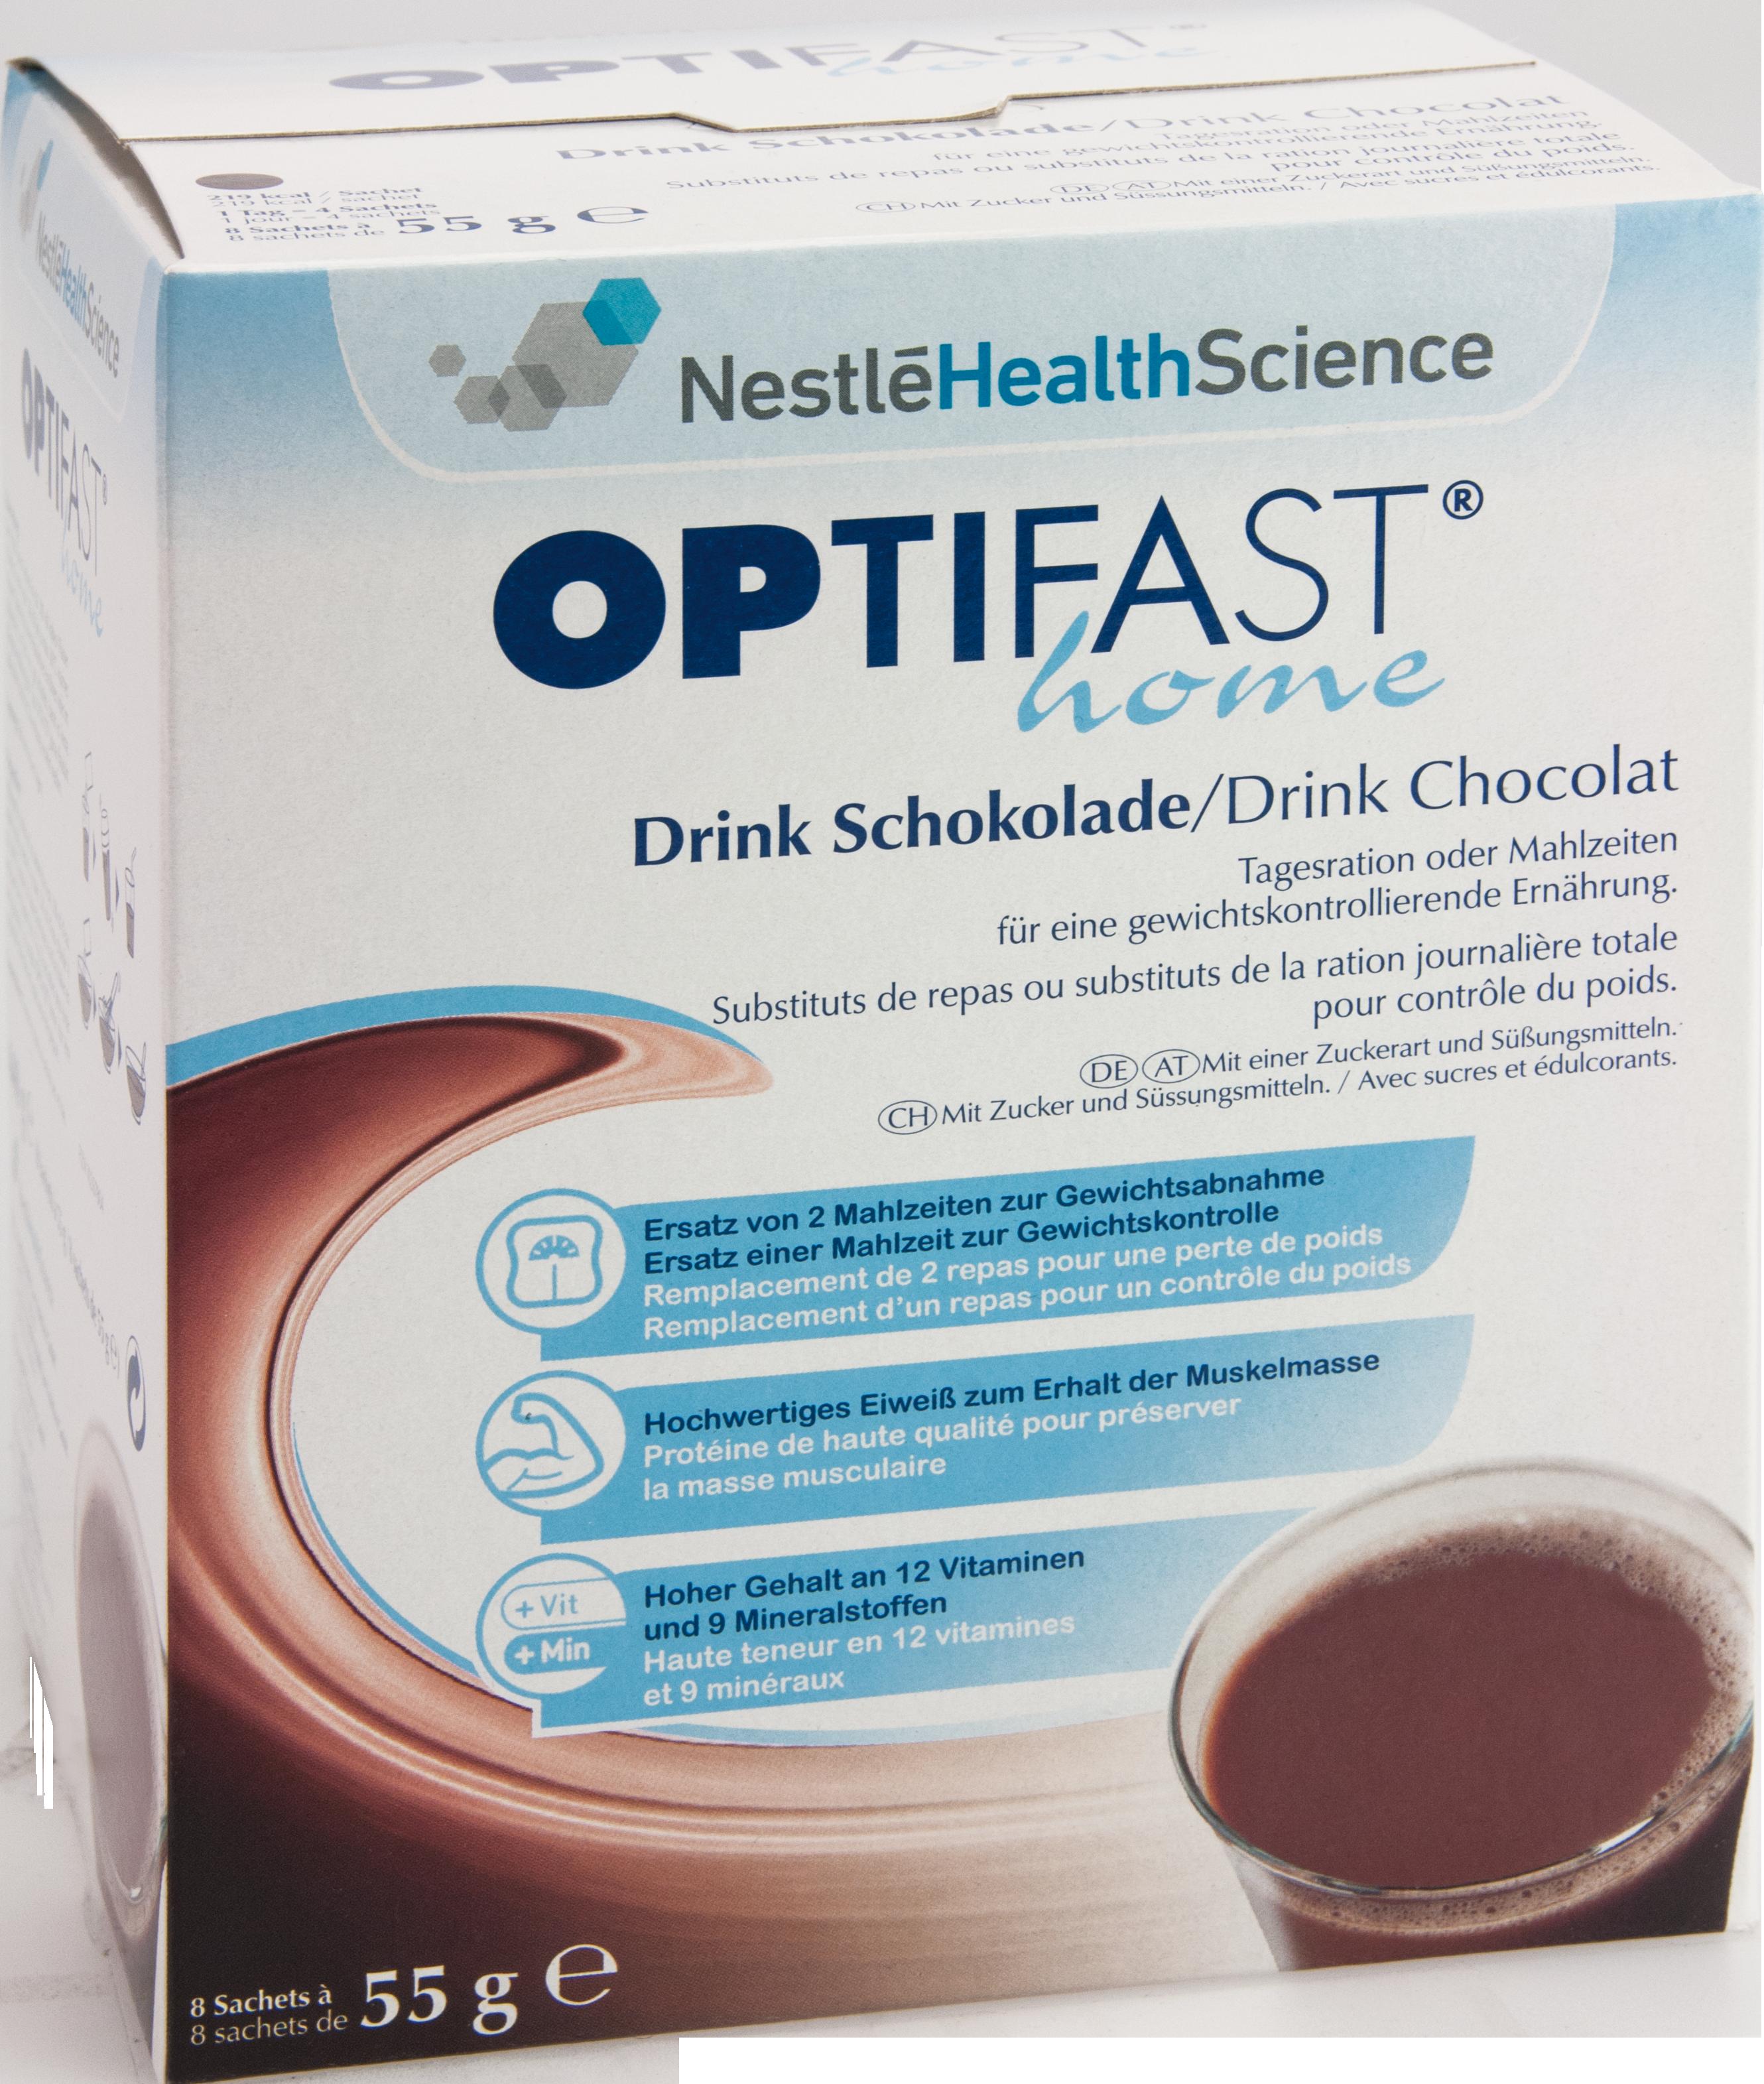 OPTIFAST home Drink Schokolade